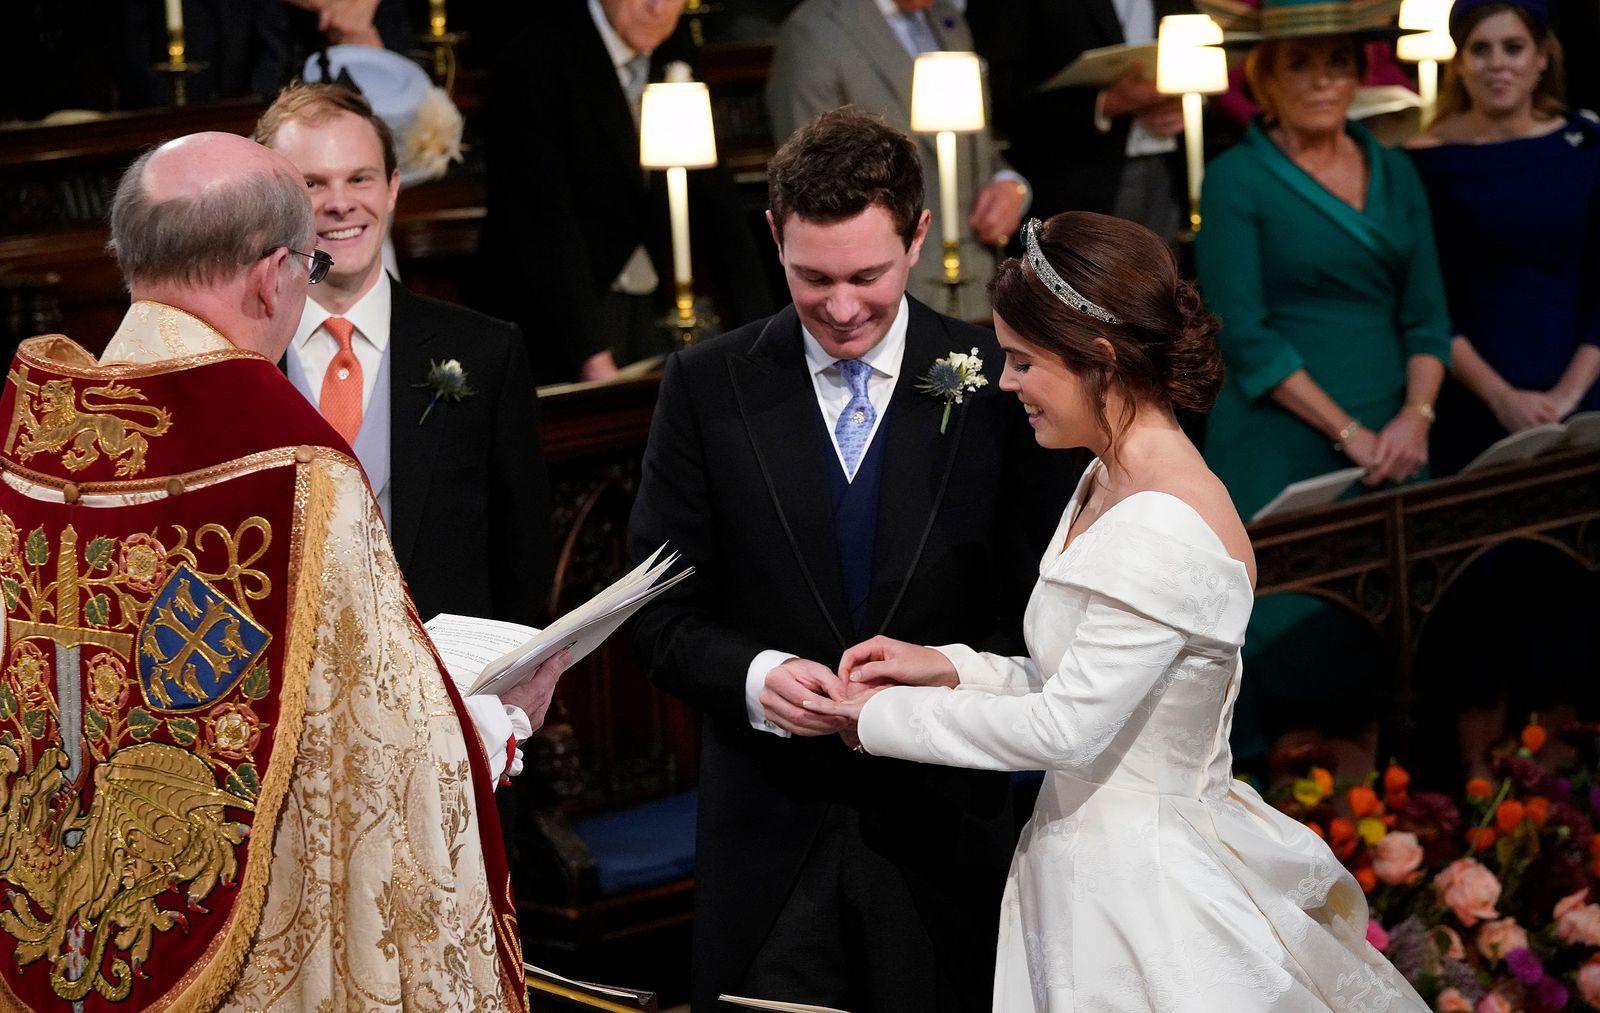 37+ Princess beatrice wedding ring ideas in 2021